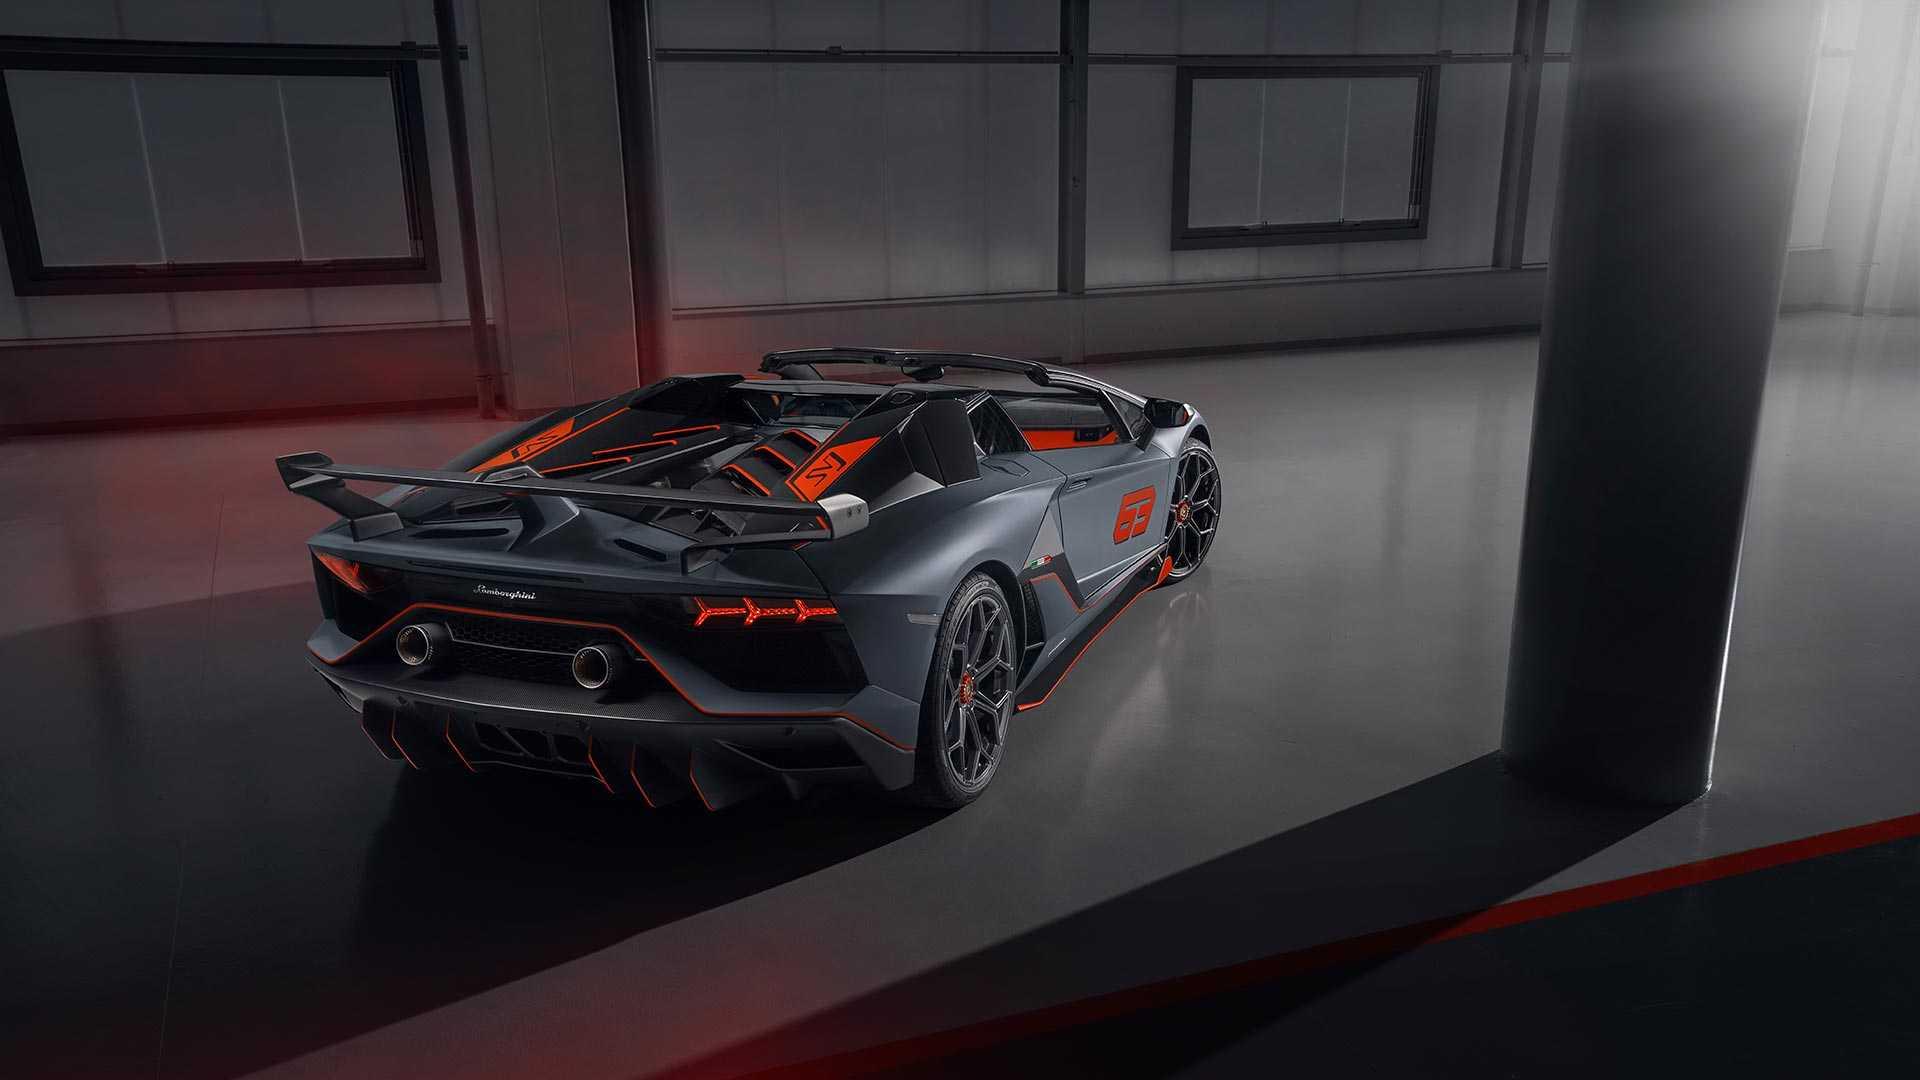 2020 Lamborghini Aventador SVJ 63 Roadster Rear Three-Quarter Wallpapers (4)